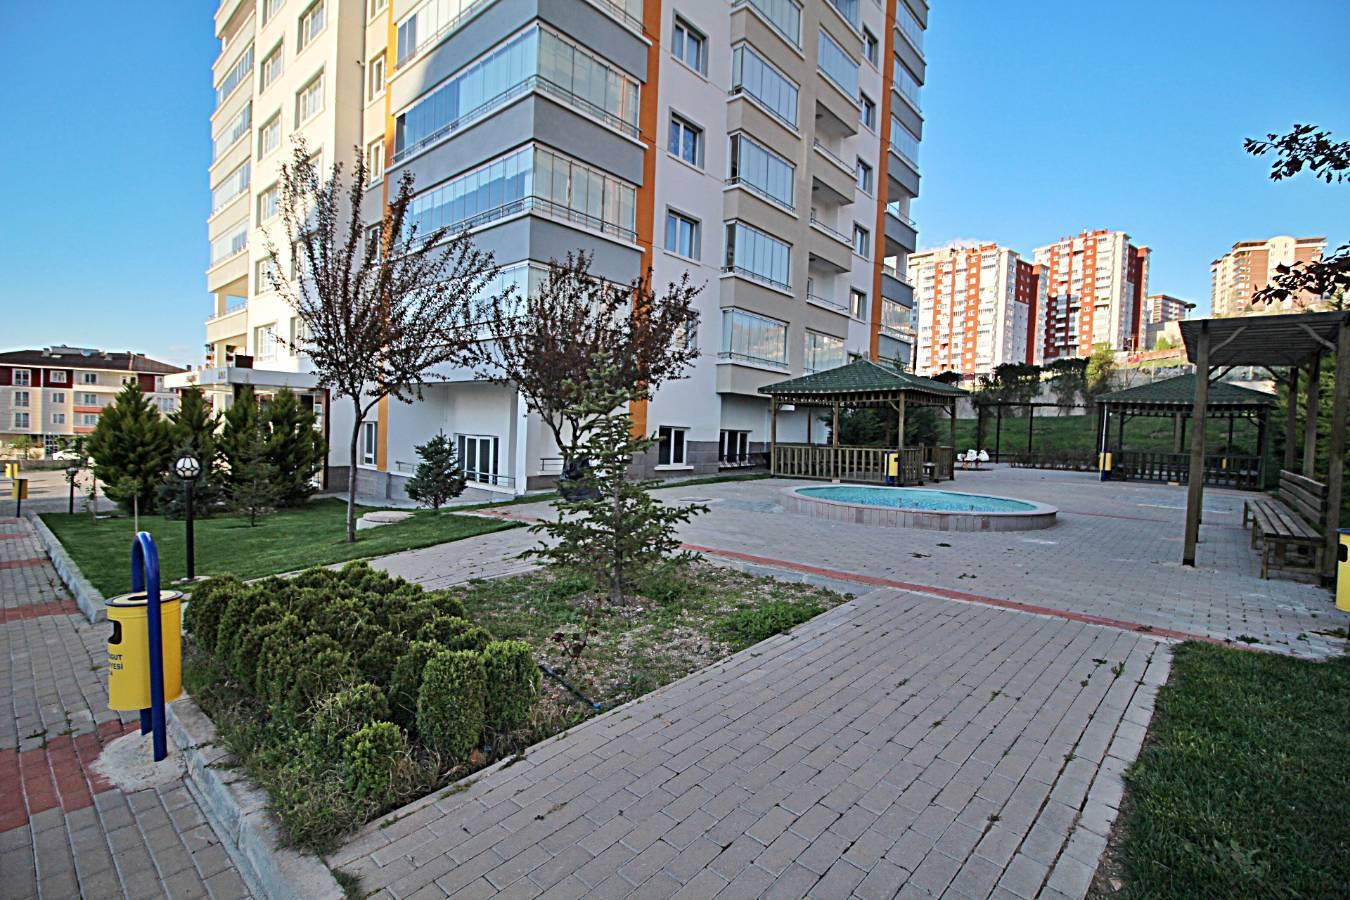 AHİMESUT MAH.DE MERKEZİ KONUMDA 3+1 SÜPERLÜKS SİTE DAİRESİ